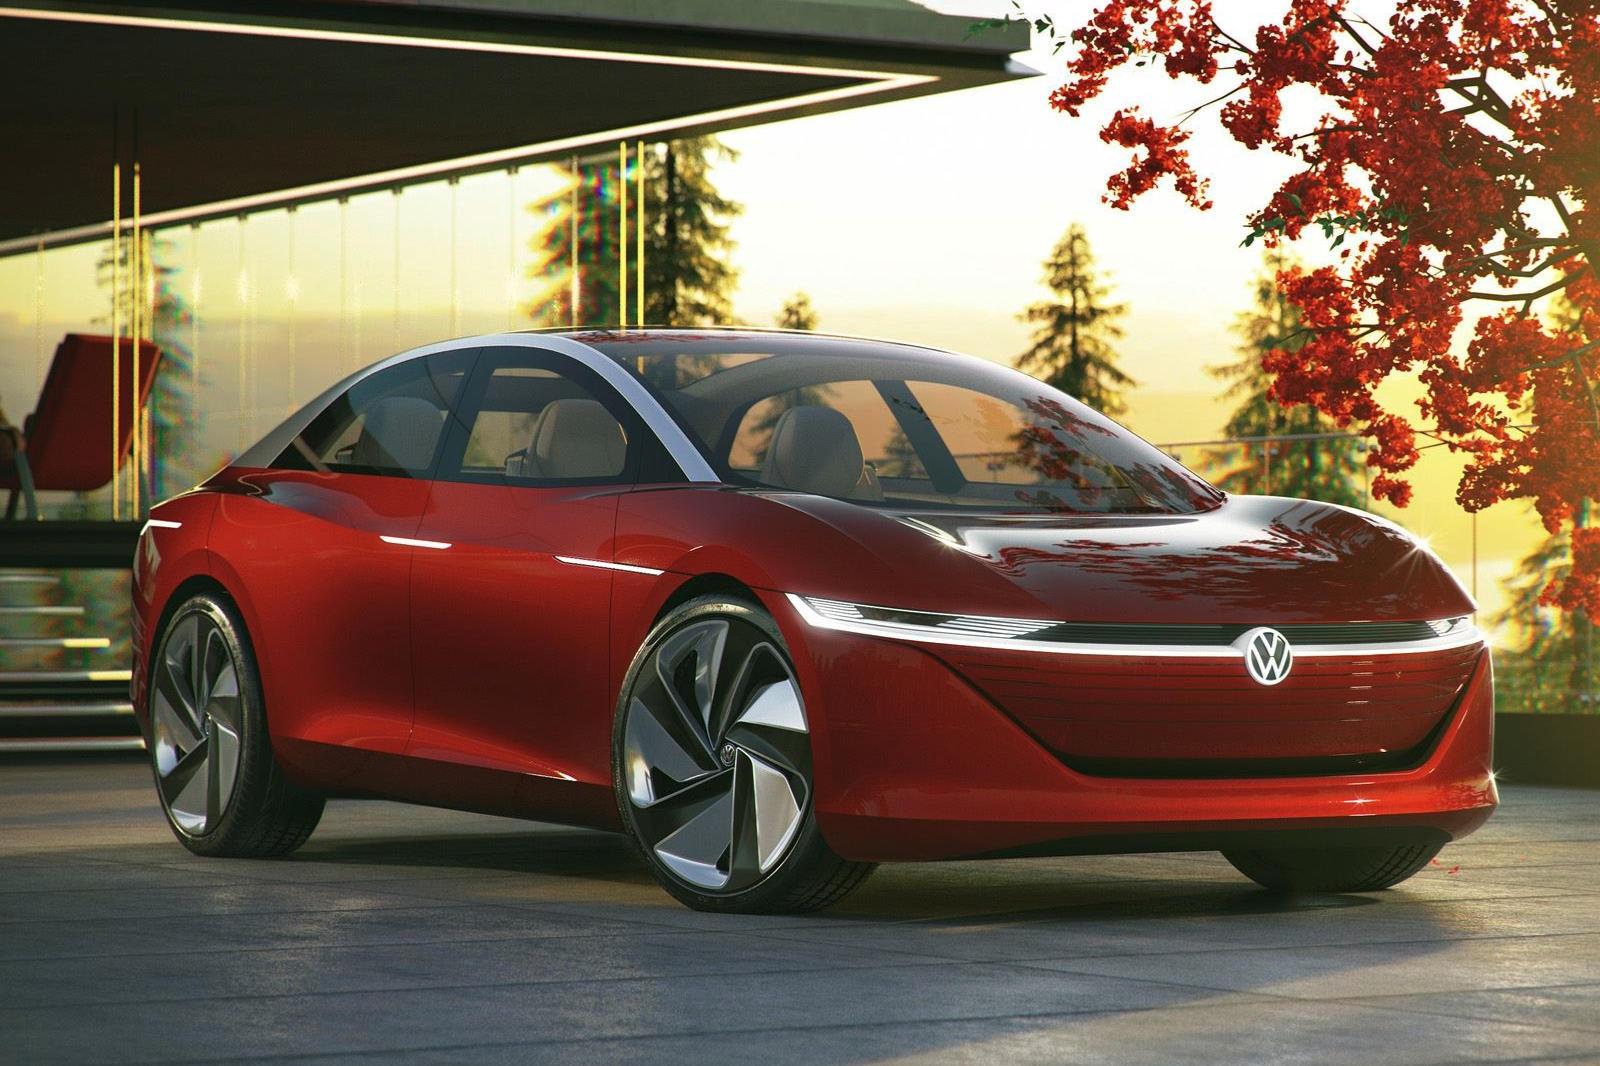 VW's Self-Driving Car Goals Face Huge Challenges